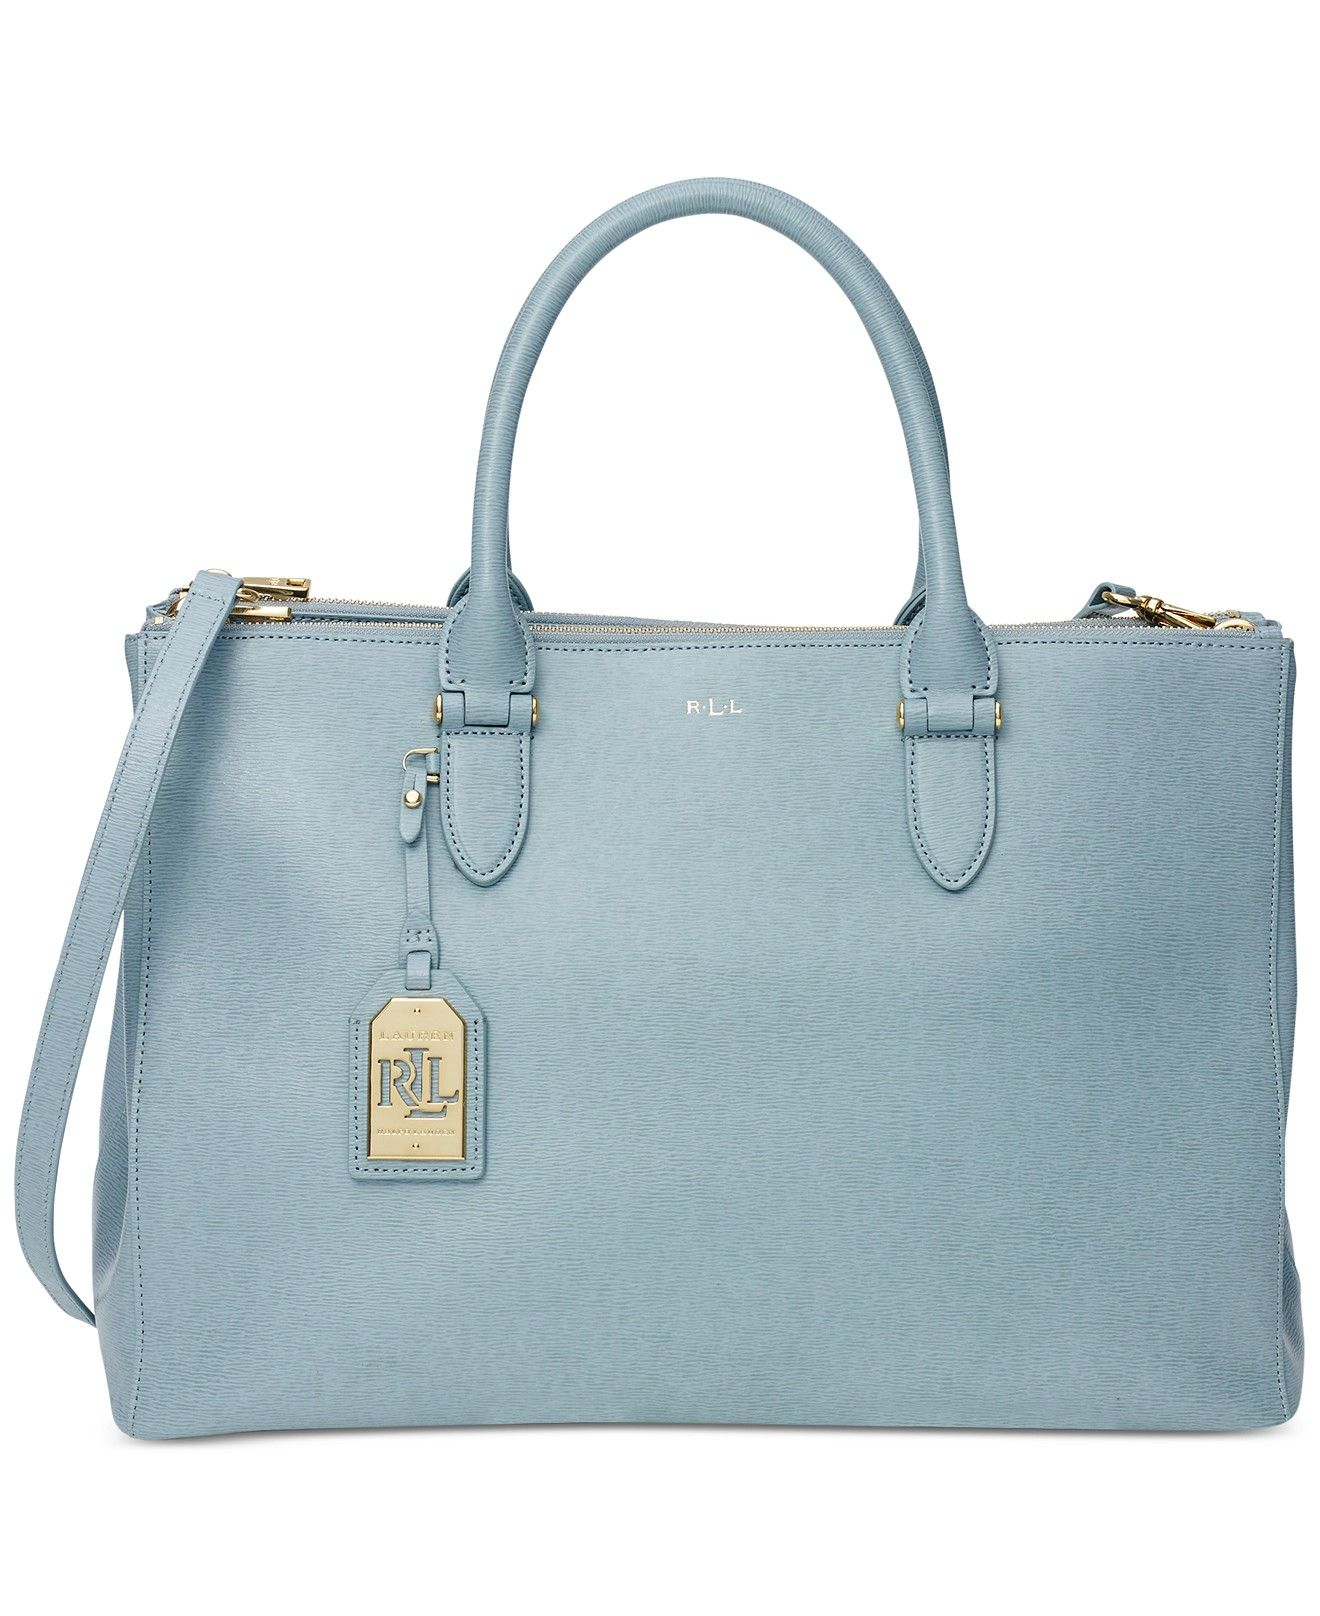 53dfa2350167 Lauren Ralph Lauren Newbury Double Zip Satchel Light Blue Leather Shoulder  Strap Handbag Designer Fashion